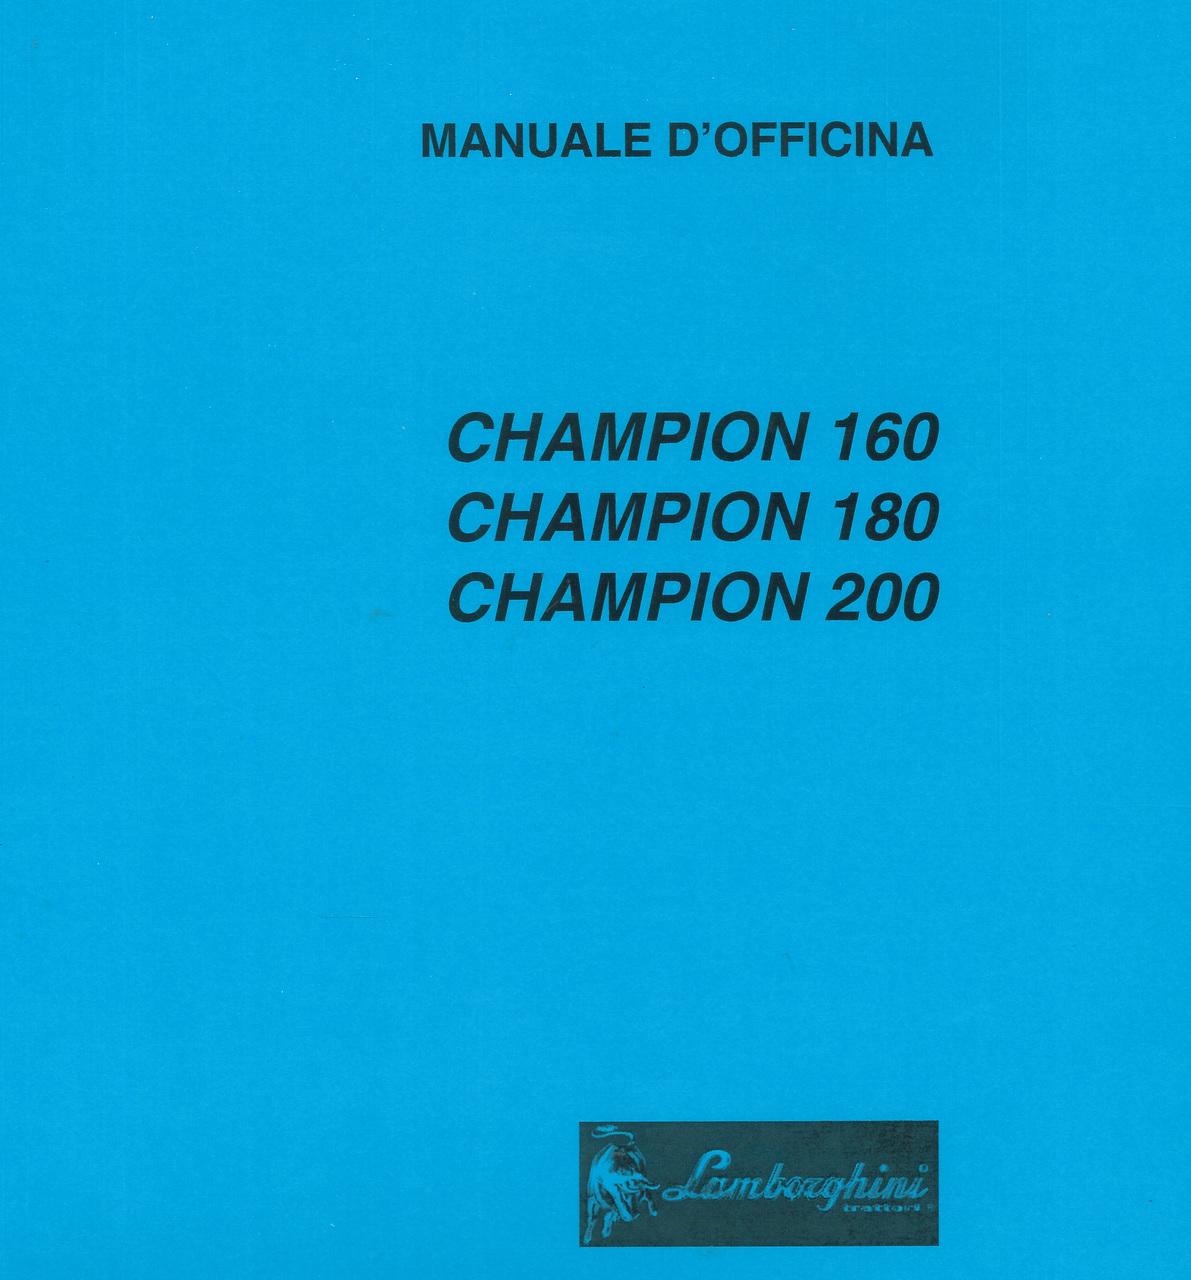 CHAMPION 160 - CHAMPION 180 - CHAMPION 200 - Manuale d'officina